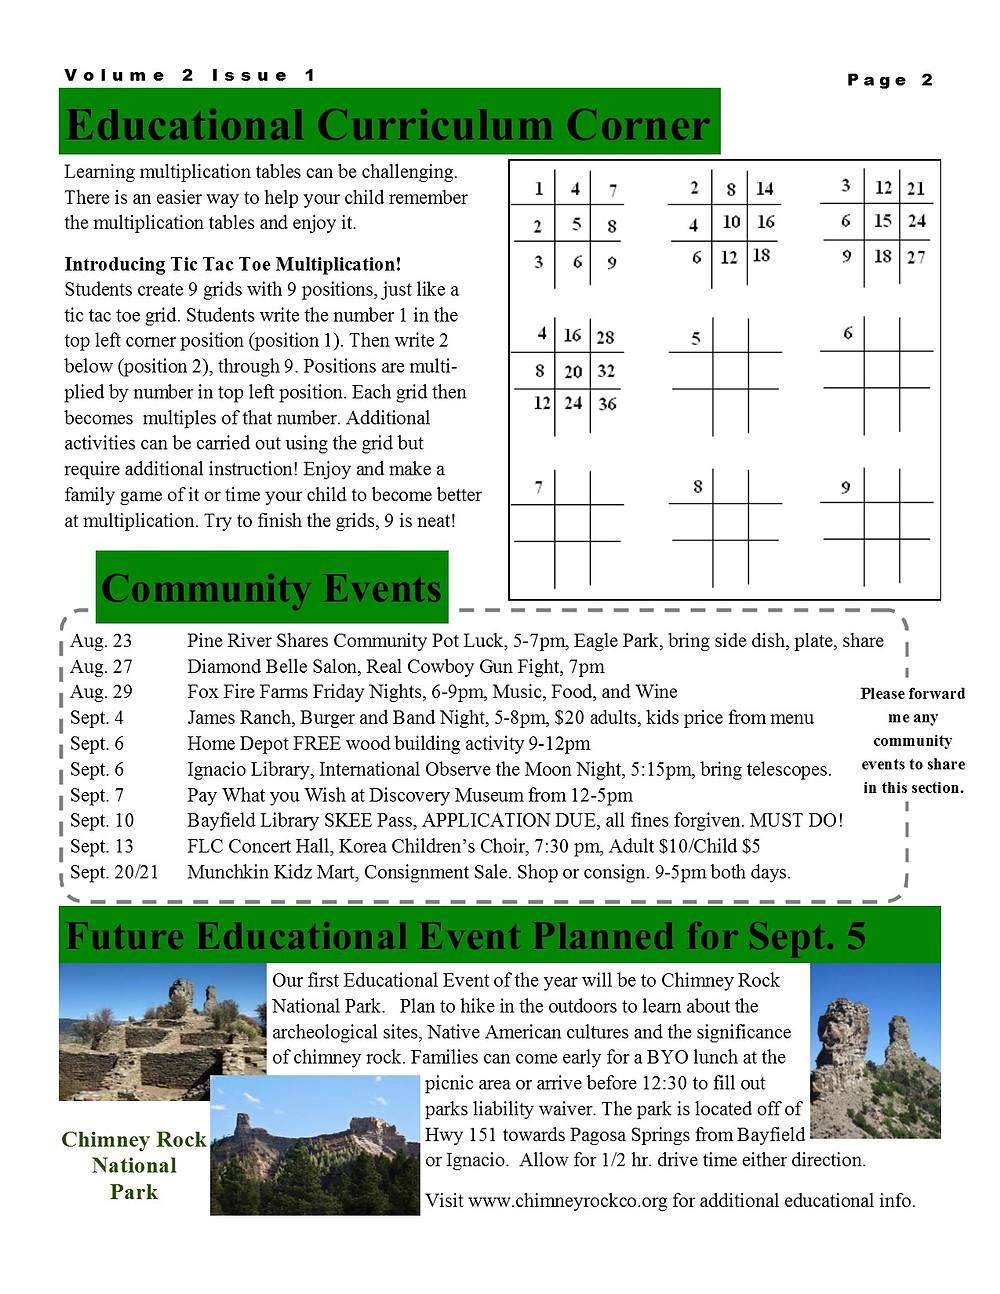 Newsletter 8-20-14 Page 2.jpg